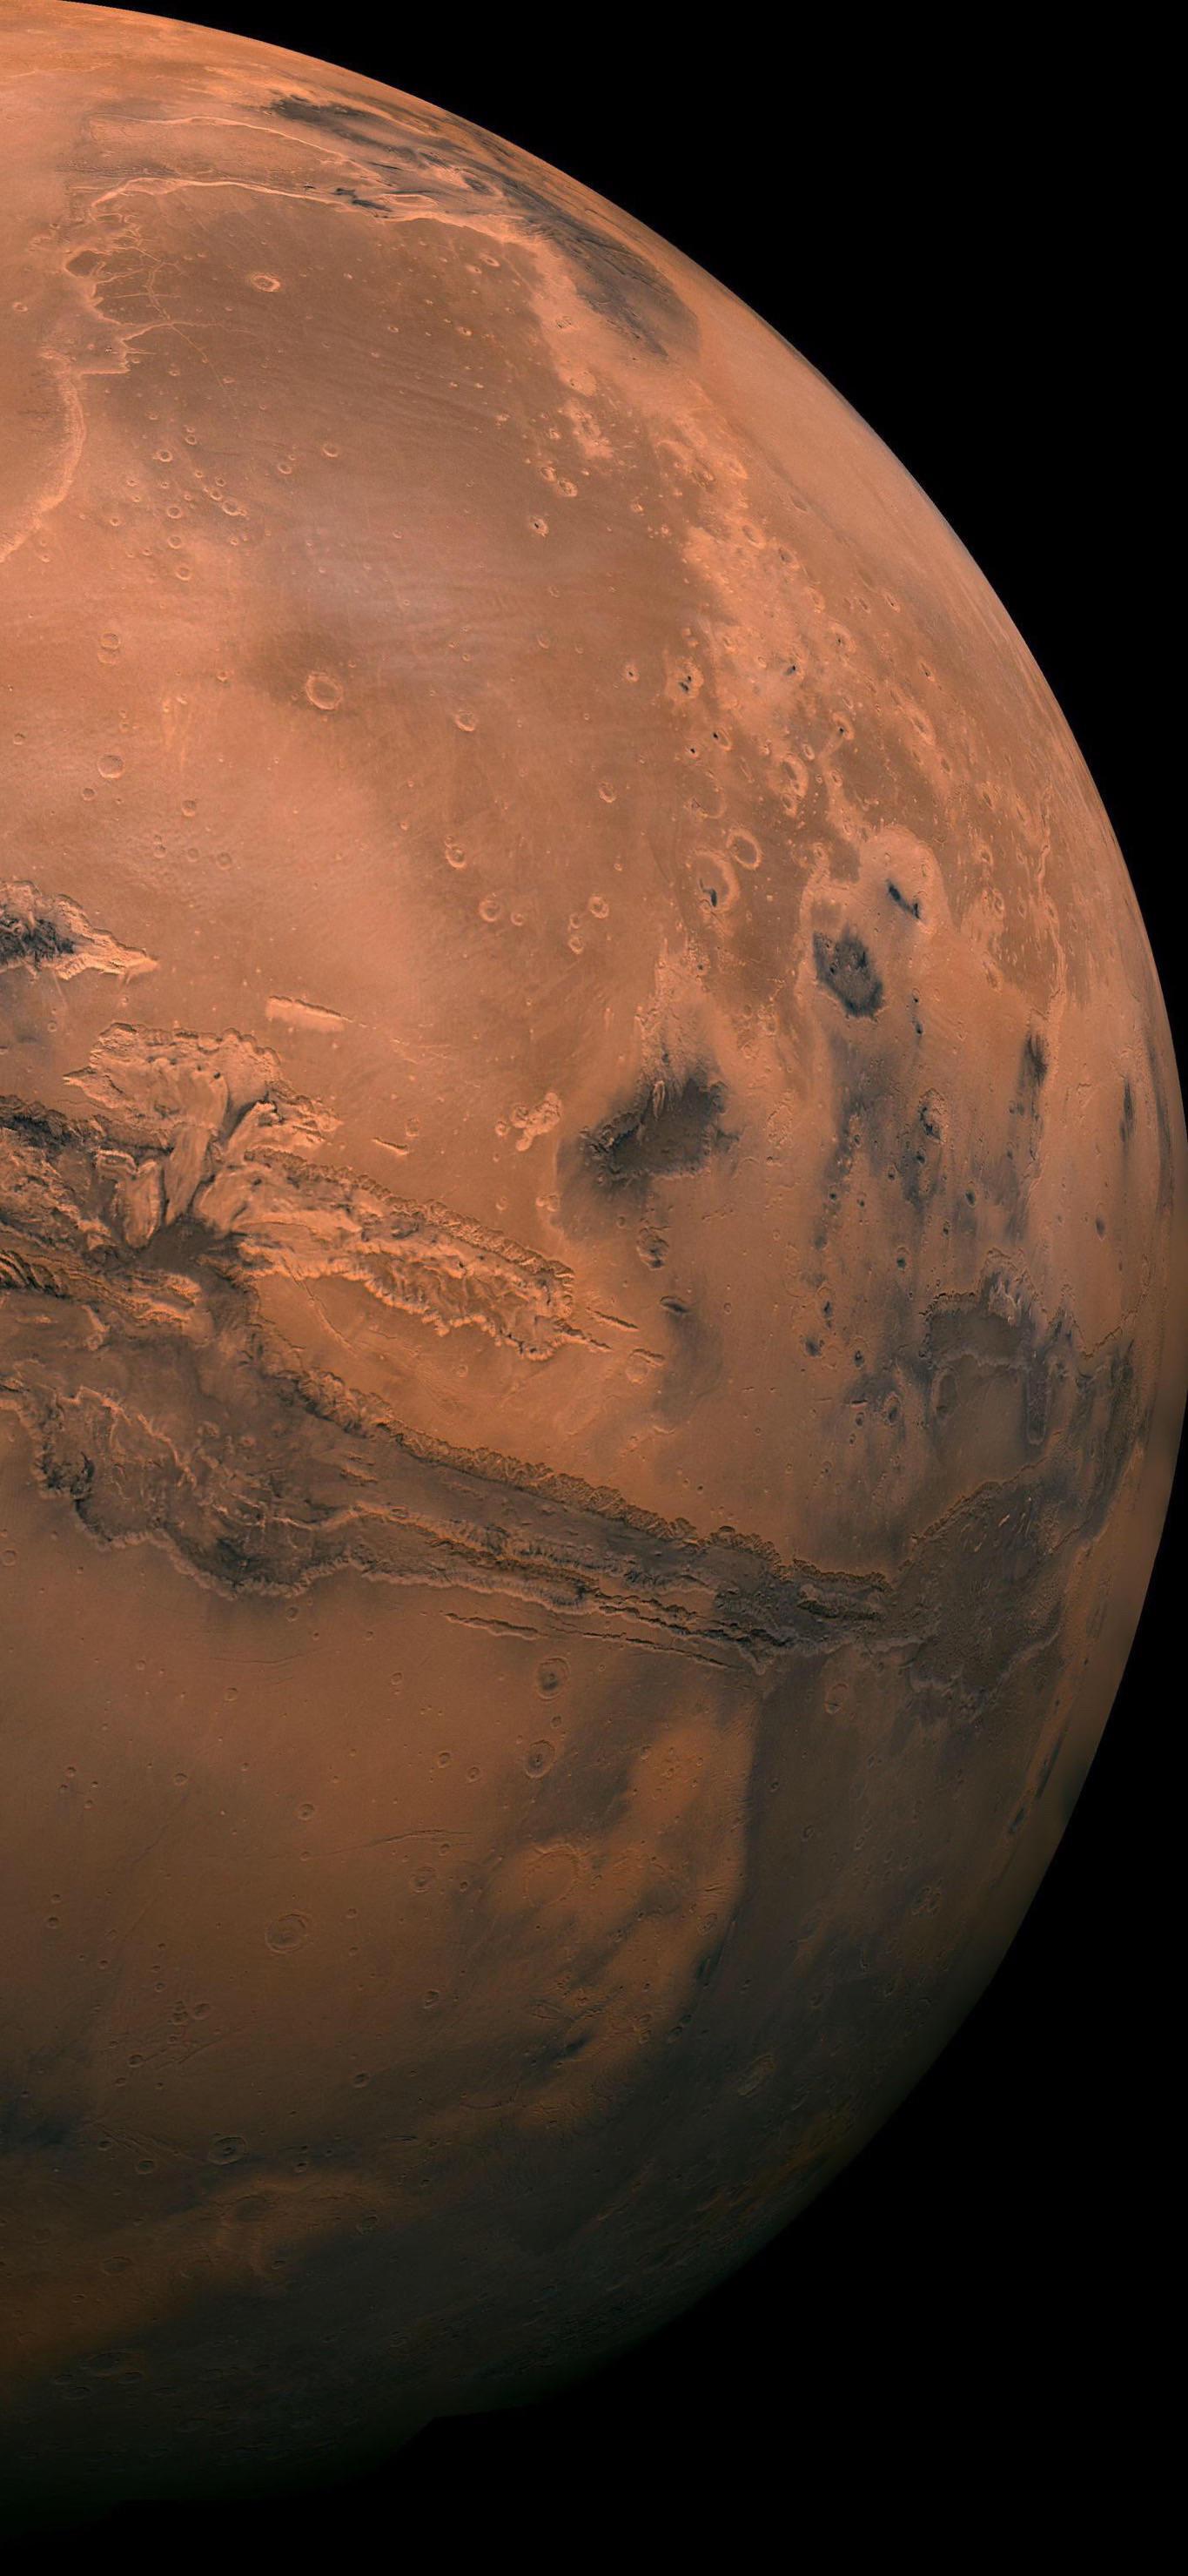 Фото Марса планеты марс космос